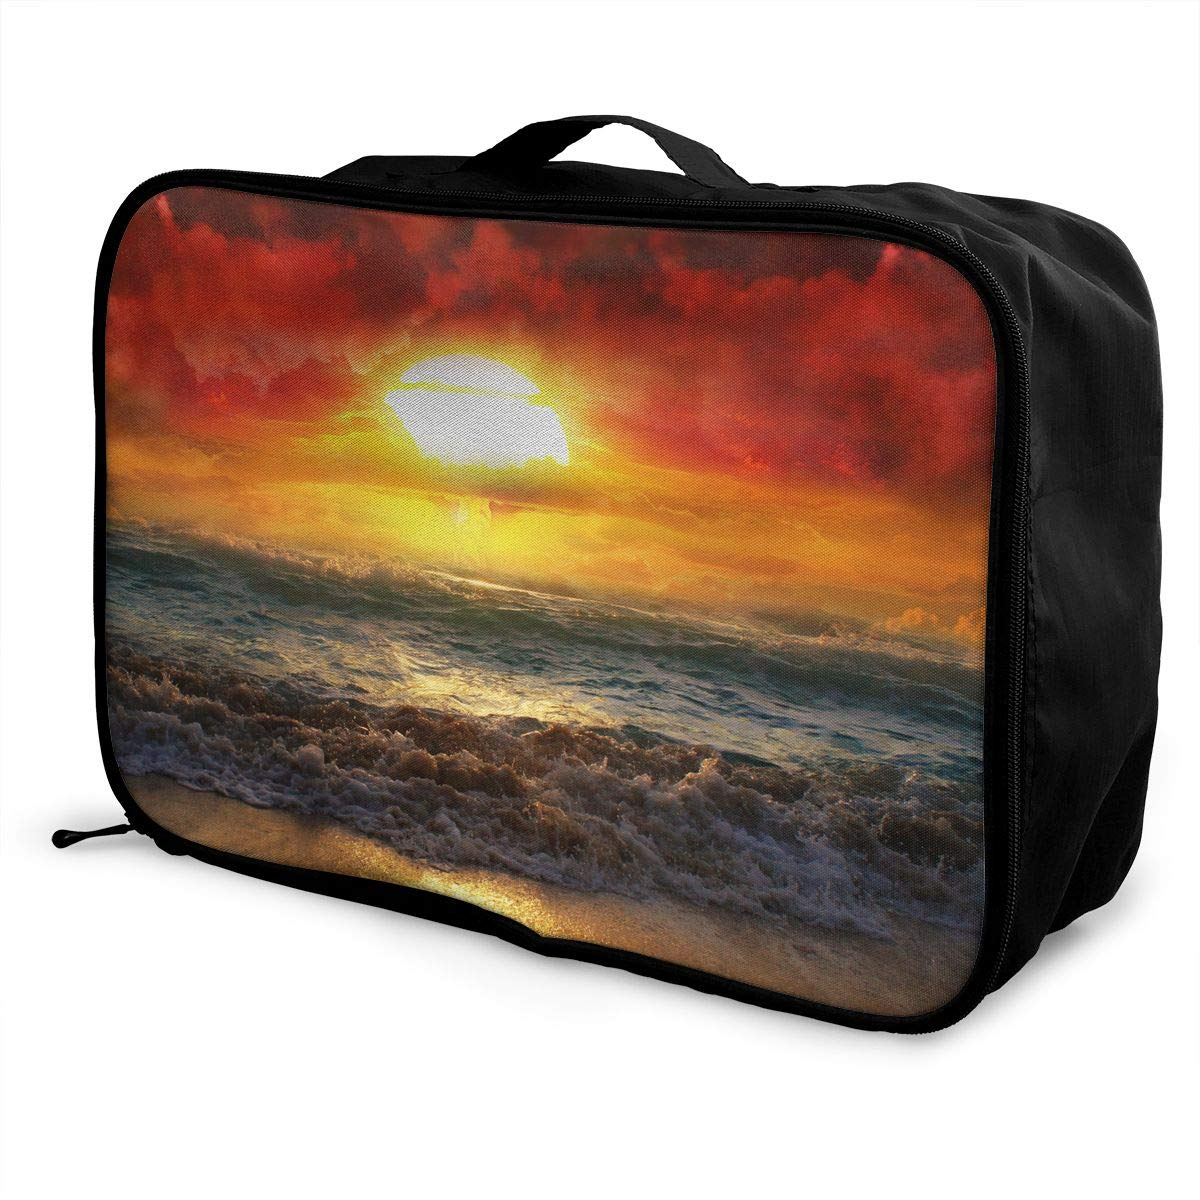 Natural Disaster Travel Bag Lightweight Luggage Bags Duffle Bag Large Capacity Travel Organizer Bag